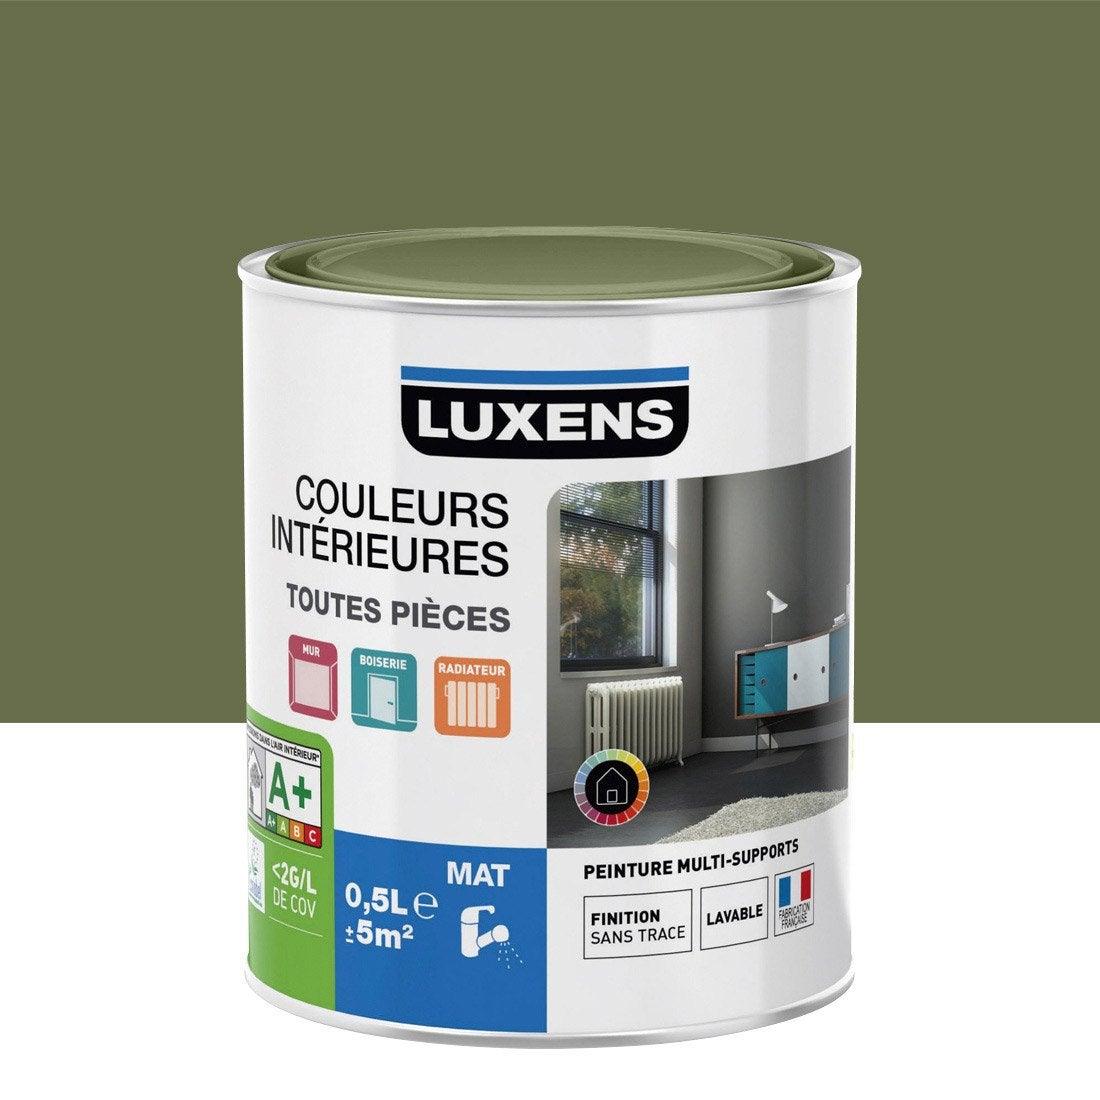 peinture vert kaki 1 luxens couleurs int rieures mat 0 5 l leroy merlin. Black Bedroom Furniture Sets. Home Design Ideas